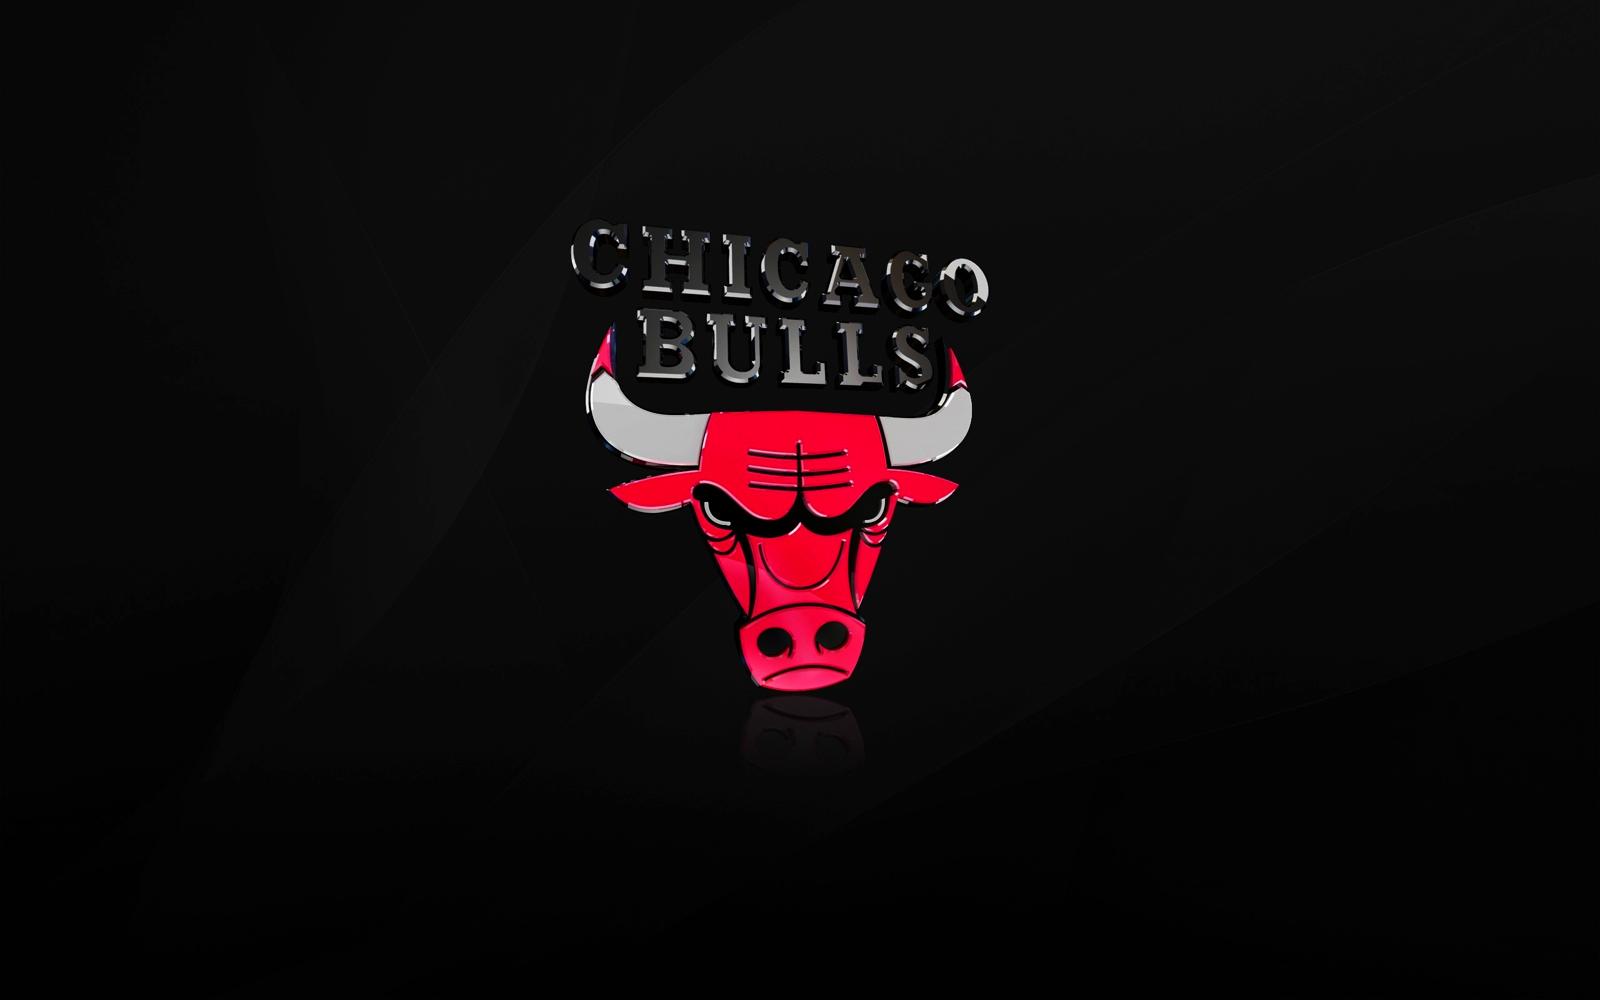 NBA Chicago Bulls Basketball Team Logo HD Wallpapers Download 1600x1000